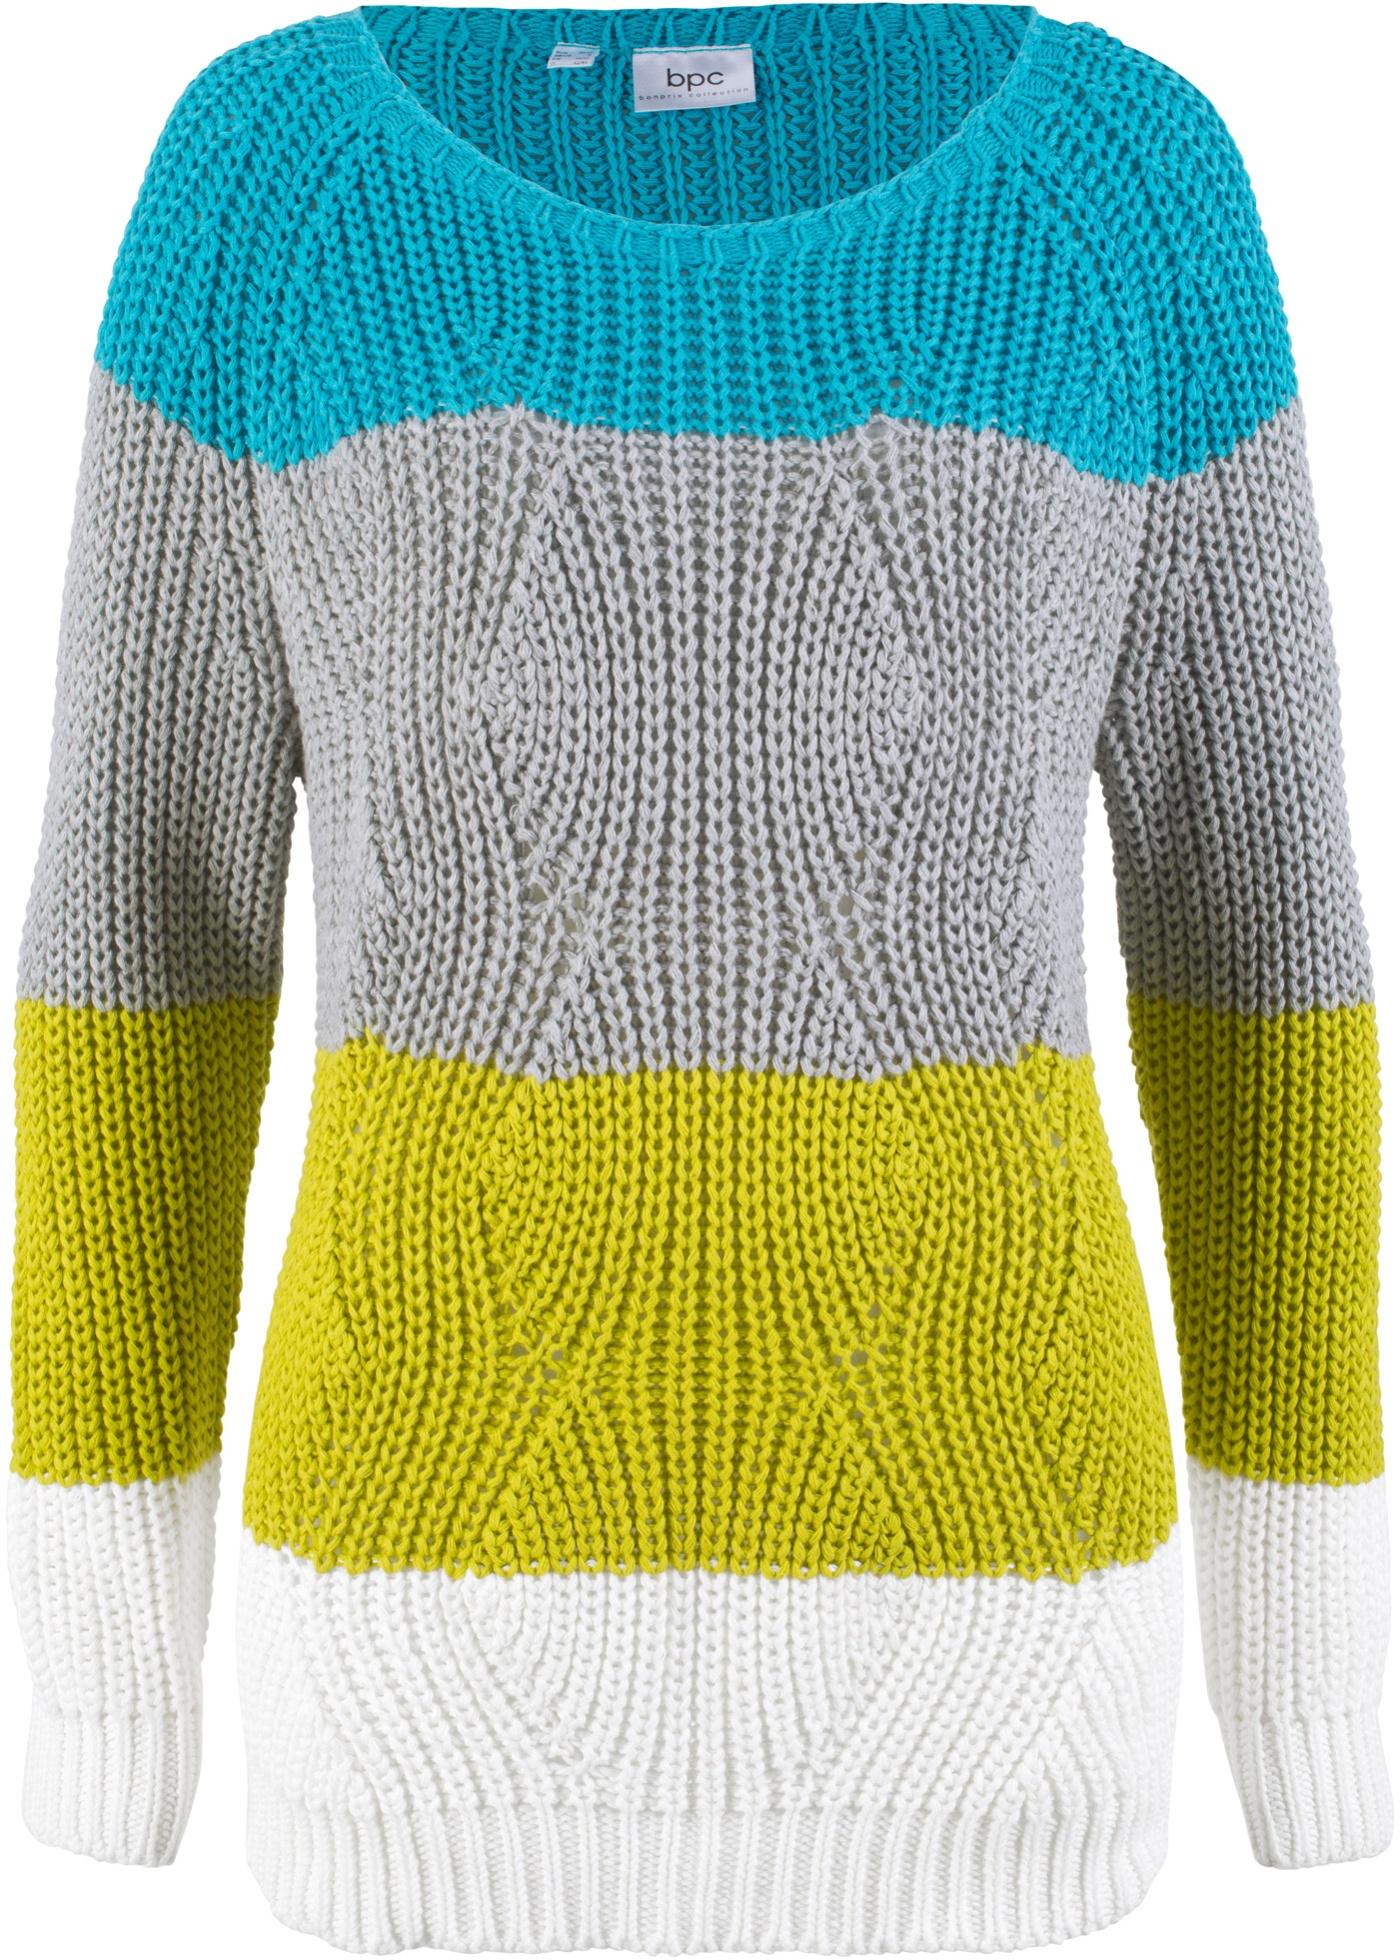 Pullover a fasce (Verde) - bpc bonprix collection